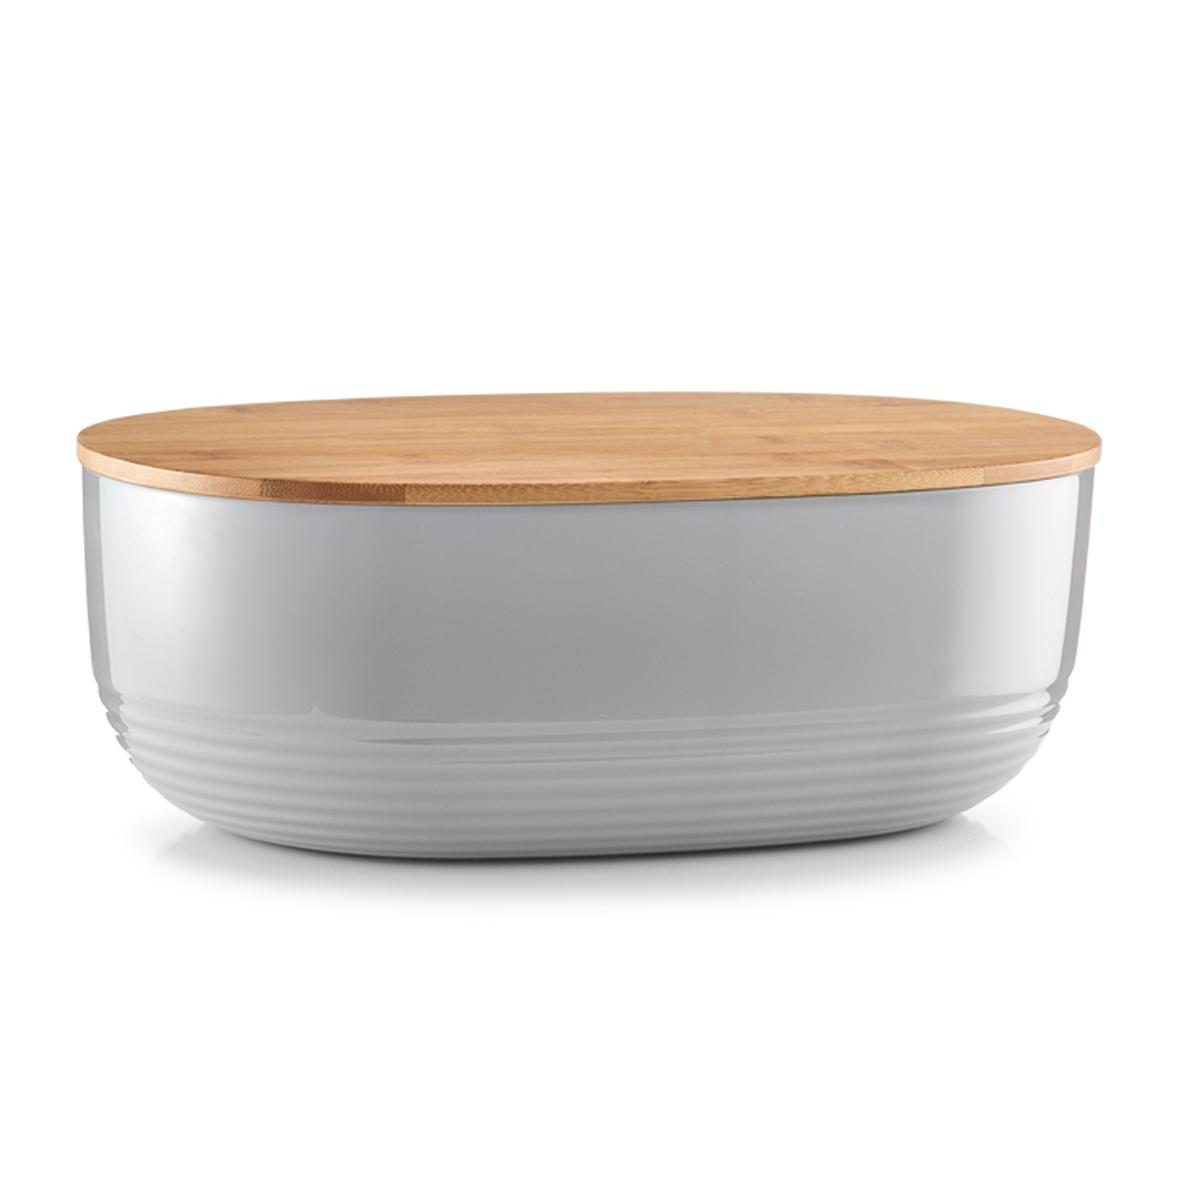 Cutie pentru paine, Bamboo Grey, l37,5xA23xH14 cm imagine